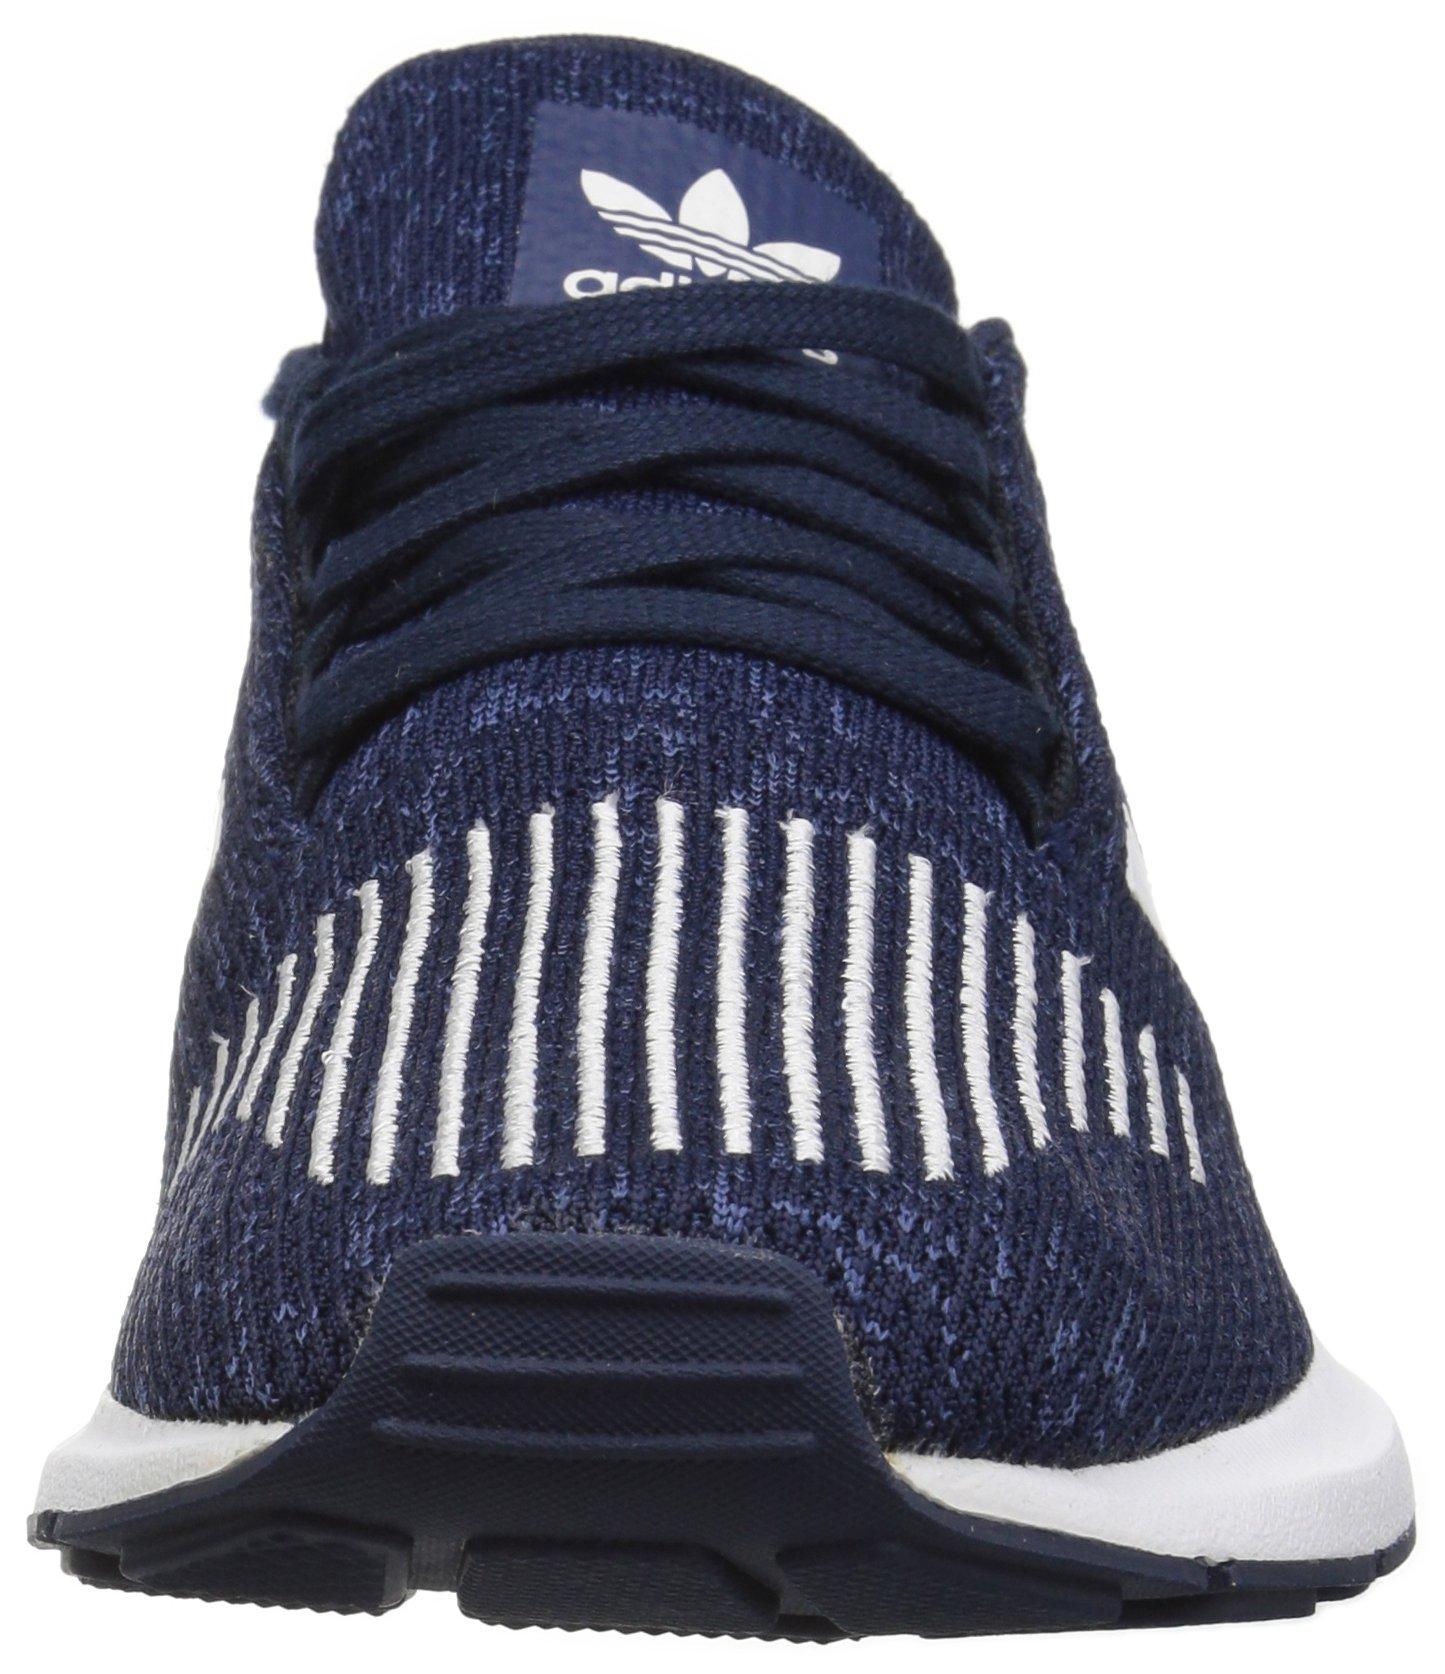 adidas Originals Baby Swift Running Shoe, Collegiate Navy/White/Mystery Blue, 4K M US Toddler by adidas Originals (Image #4)